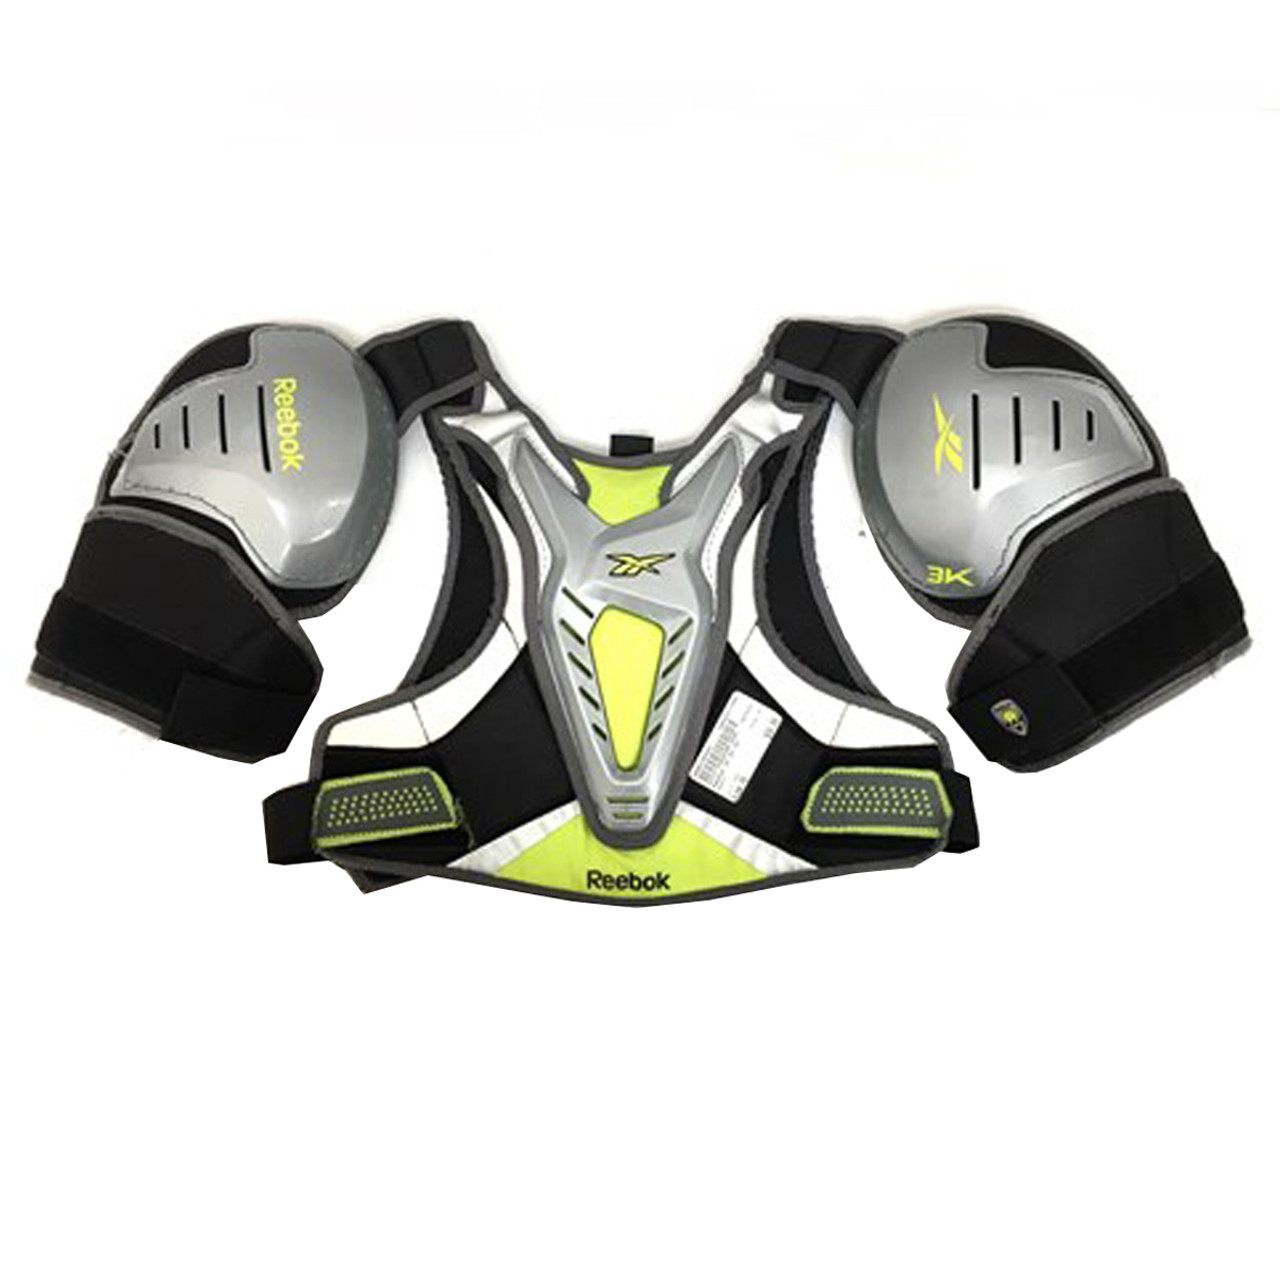 3K Lacrosse Shoulder Pads Black White X-Small